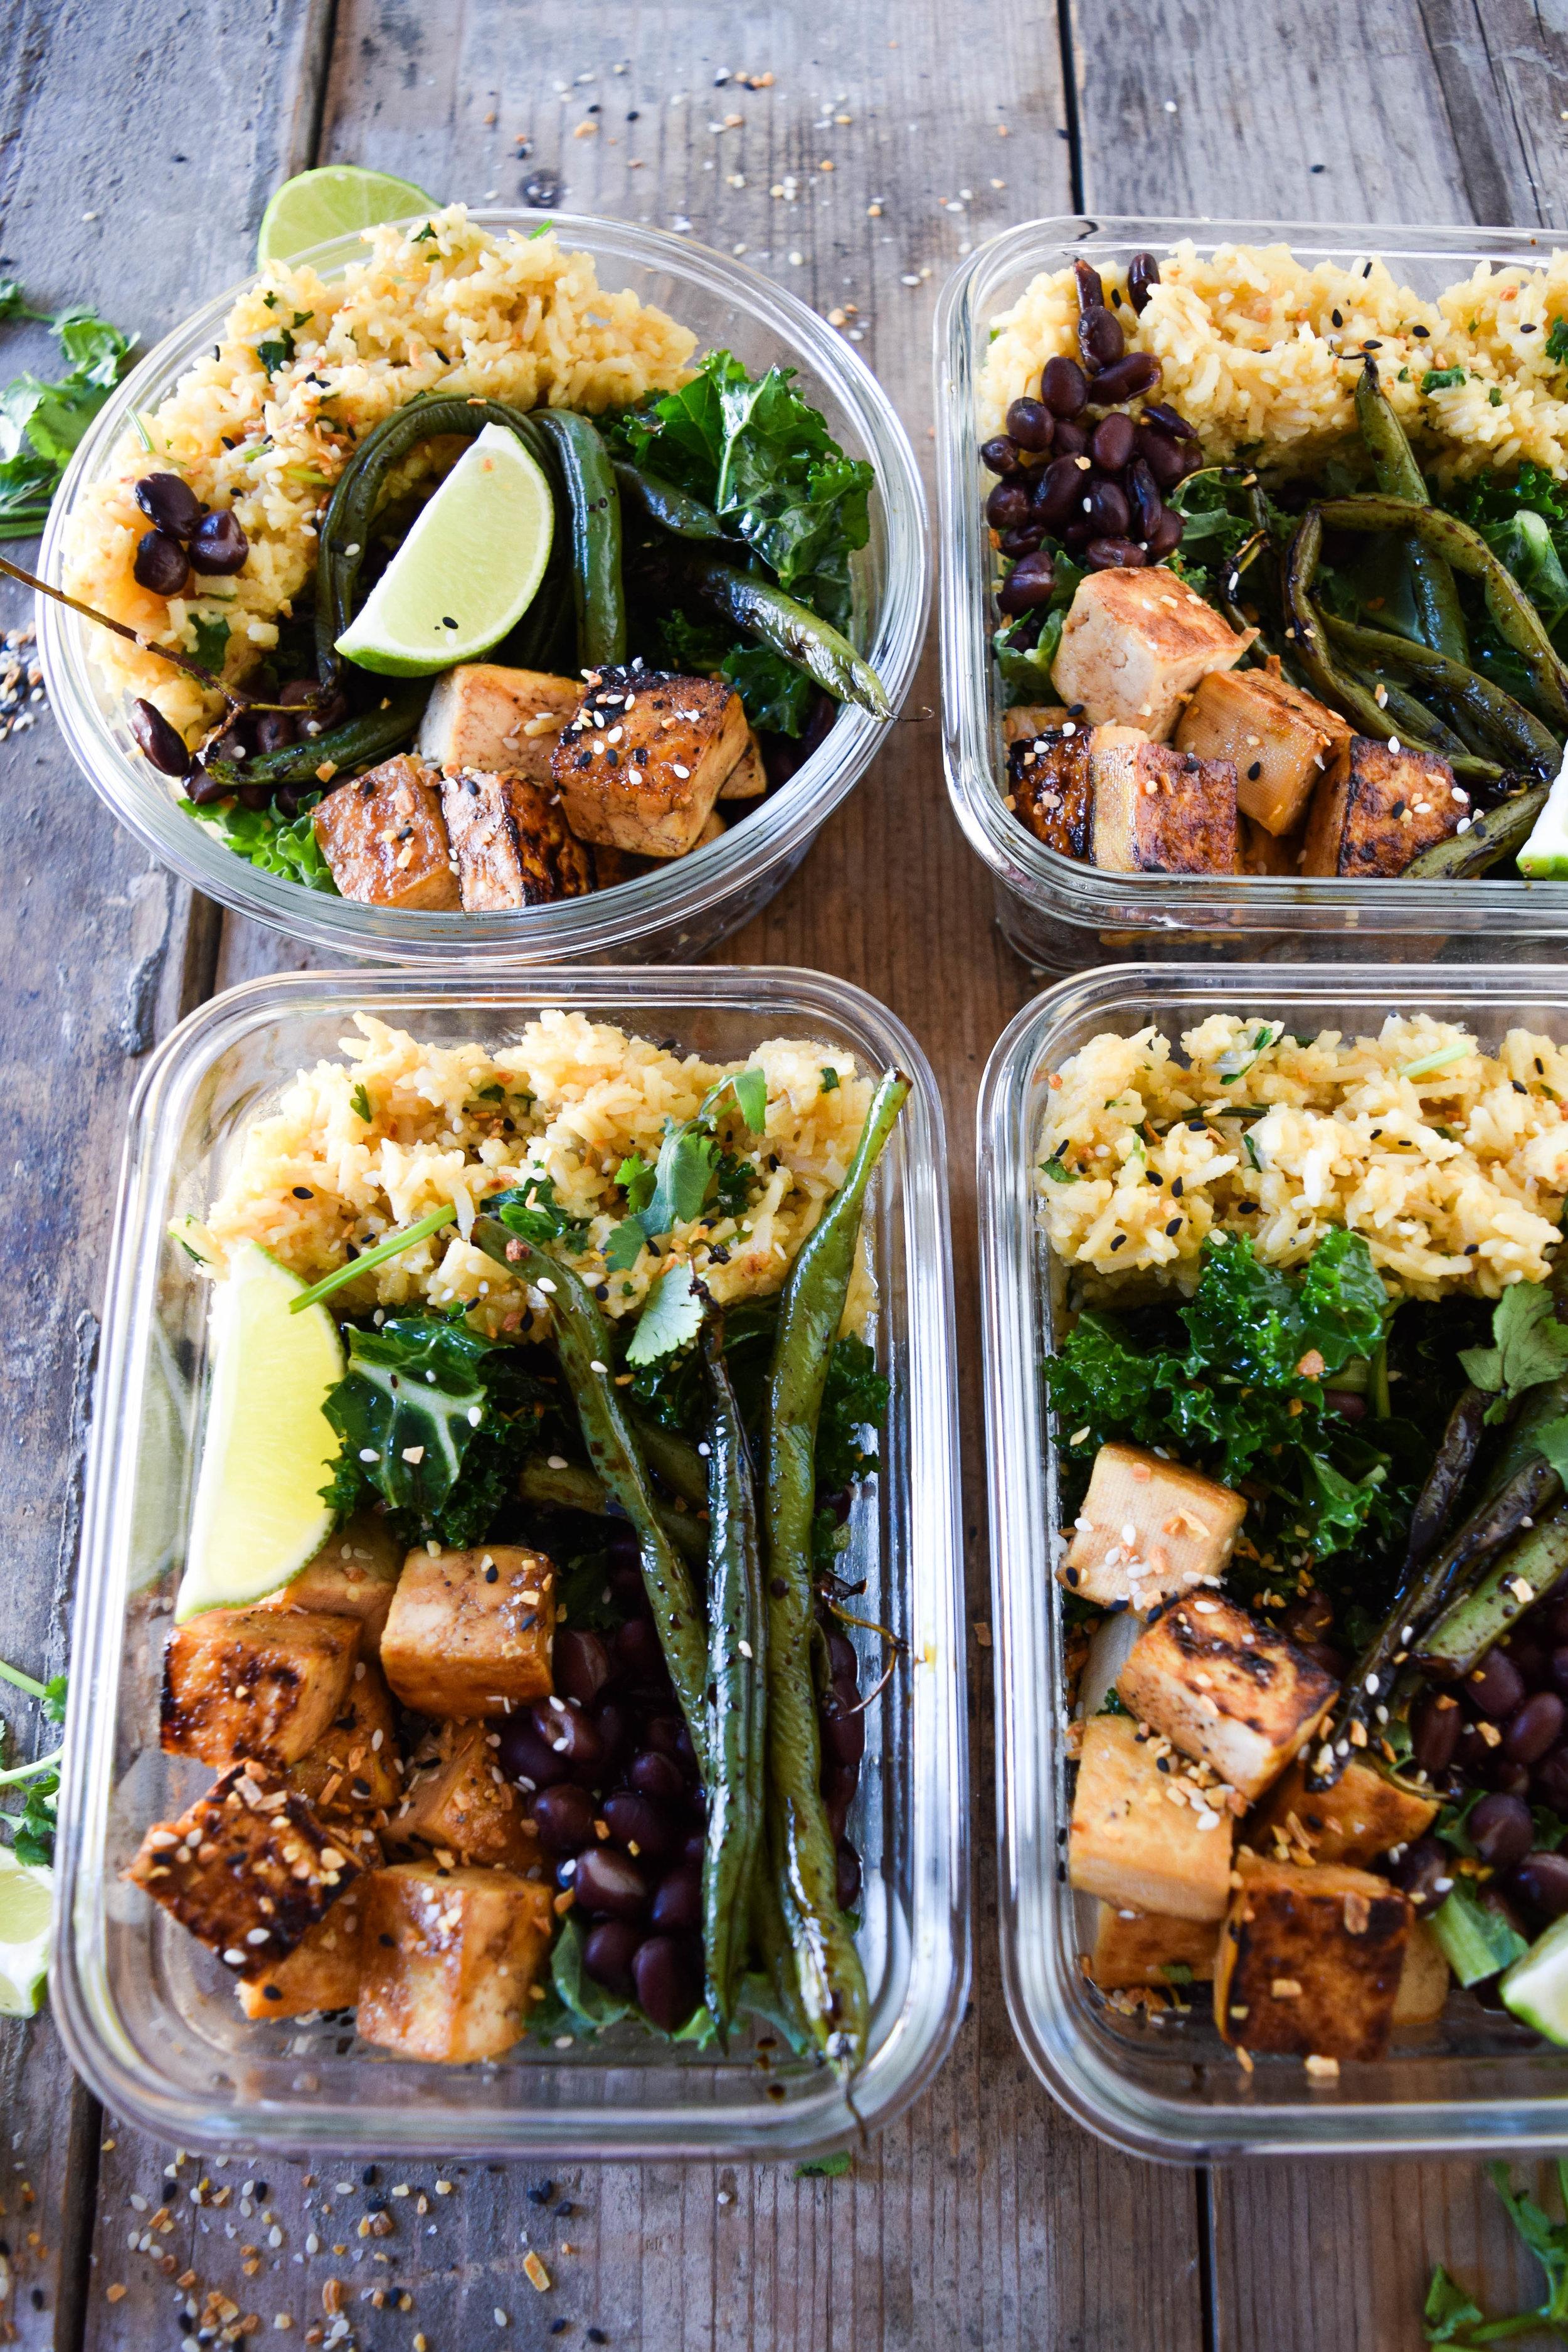 meal-prep-teriyaki-tofu-cilantro-lime-rice-veggies.jpg